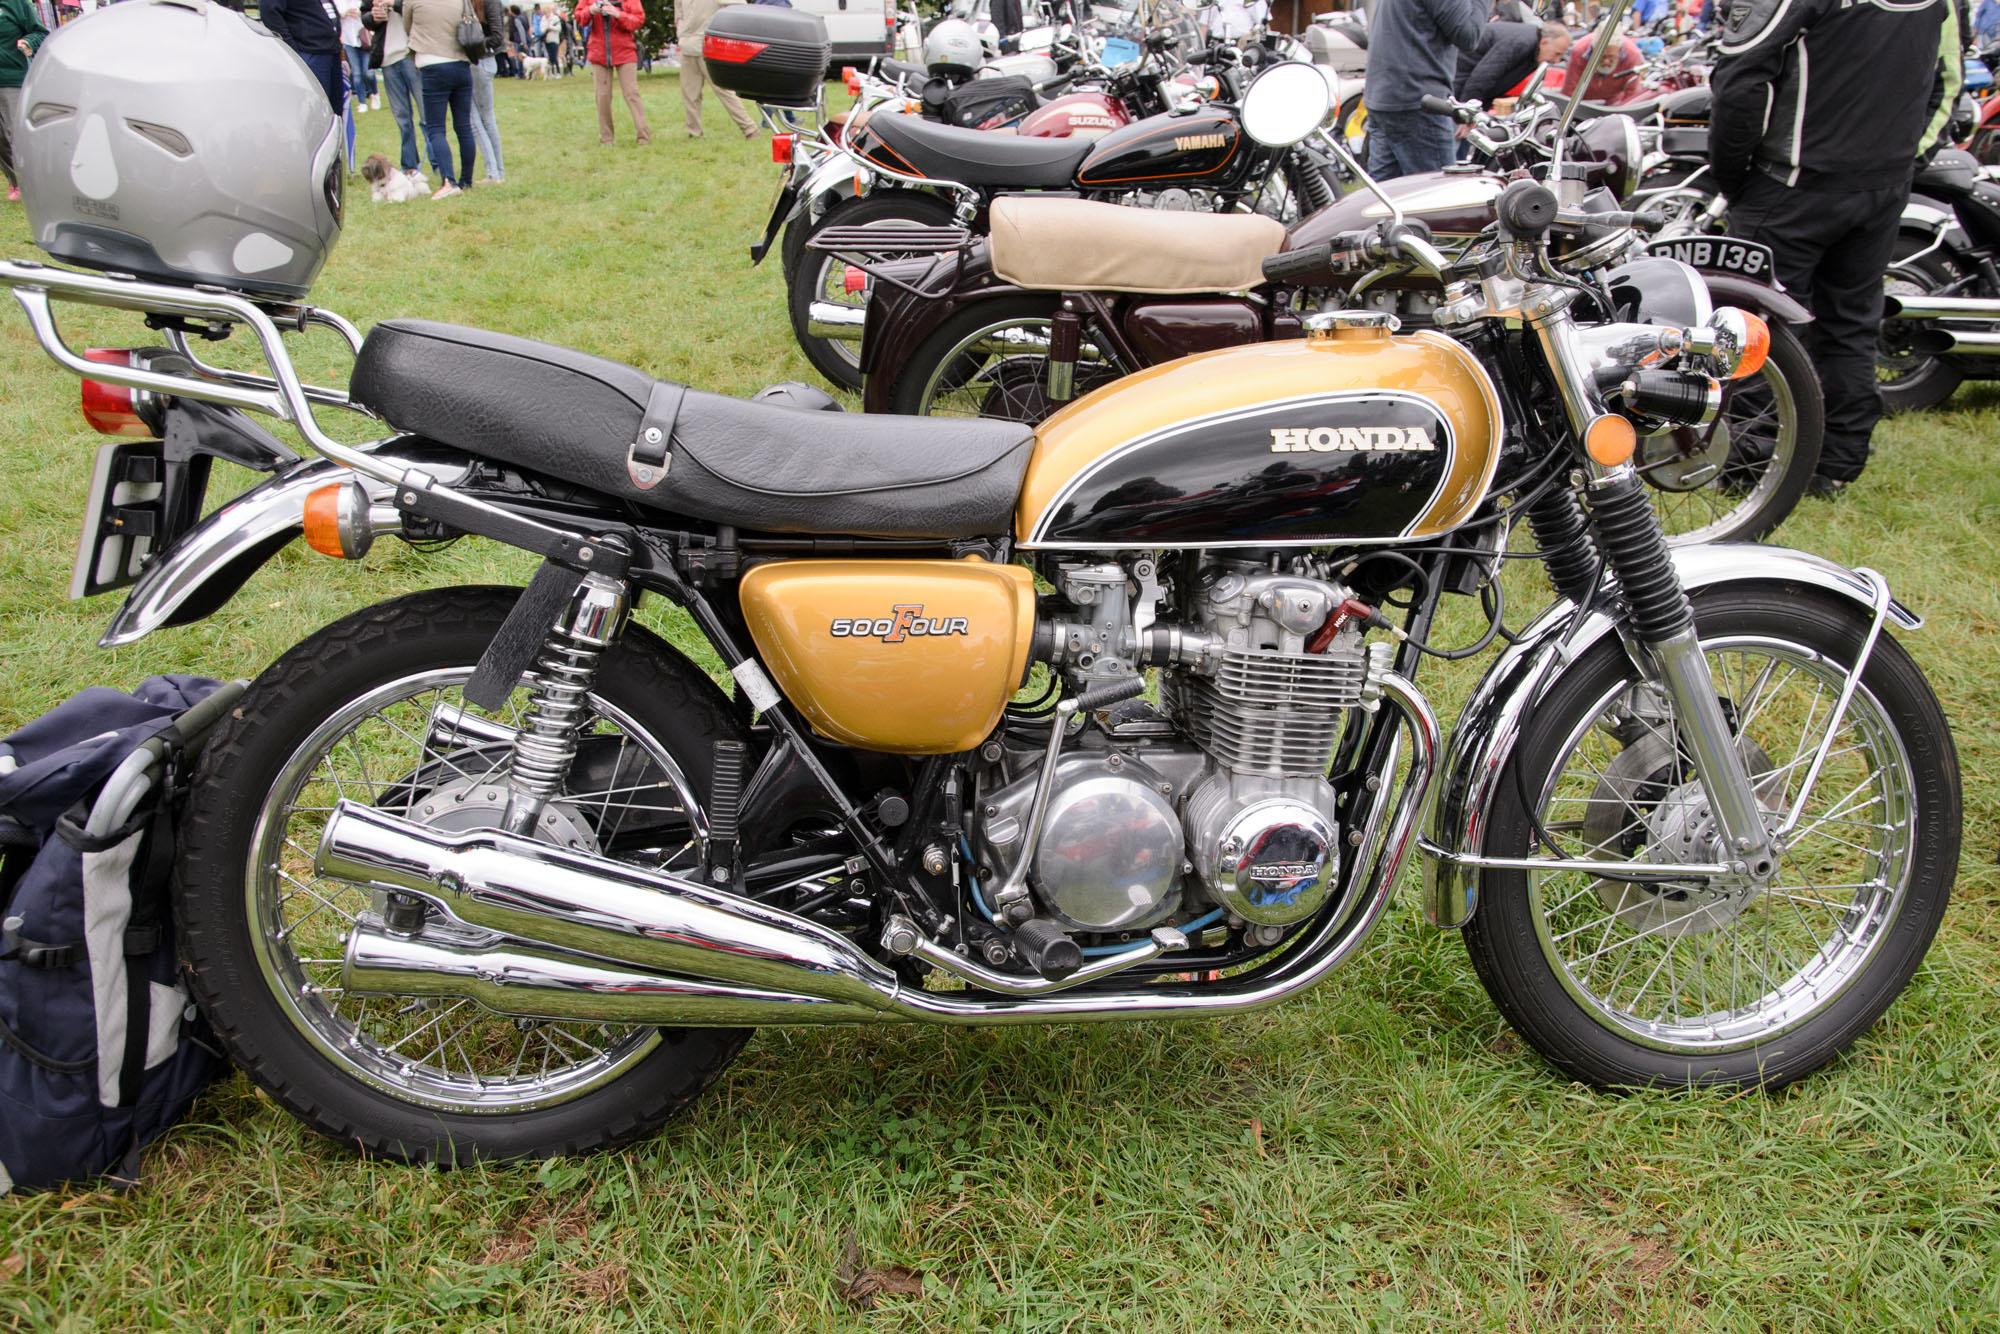 File:Honda CB500 Four (1972) - 30405345621 jpg - Wikimedia